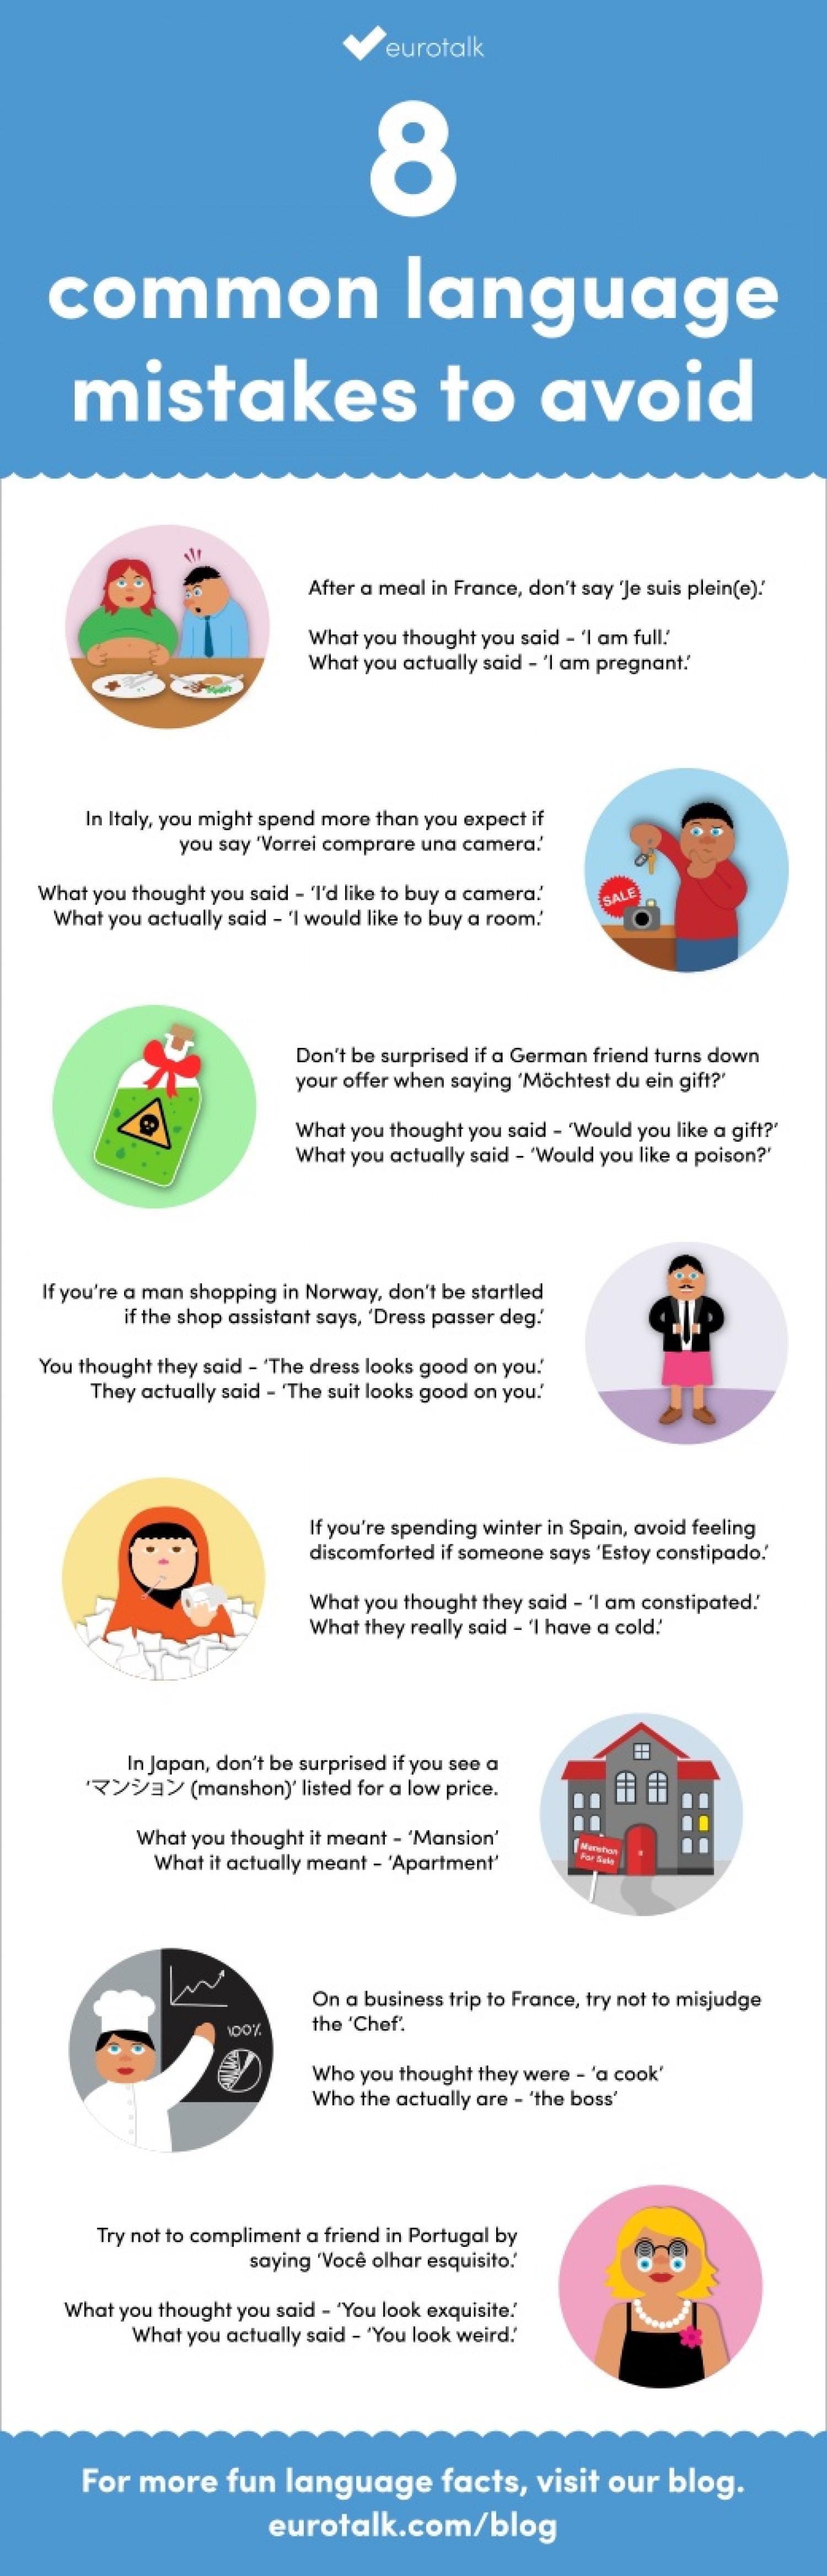 8 Common Language Mistakes to Avoid Infographic